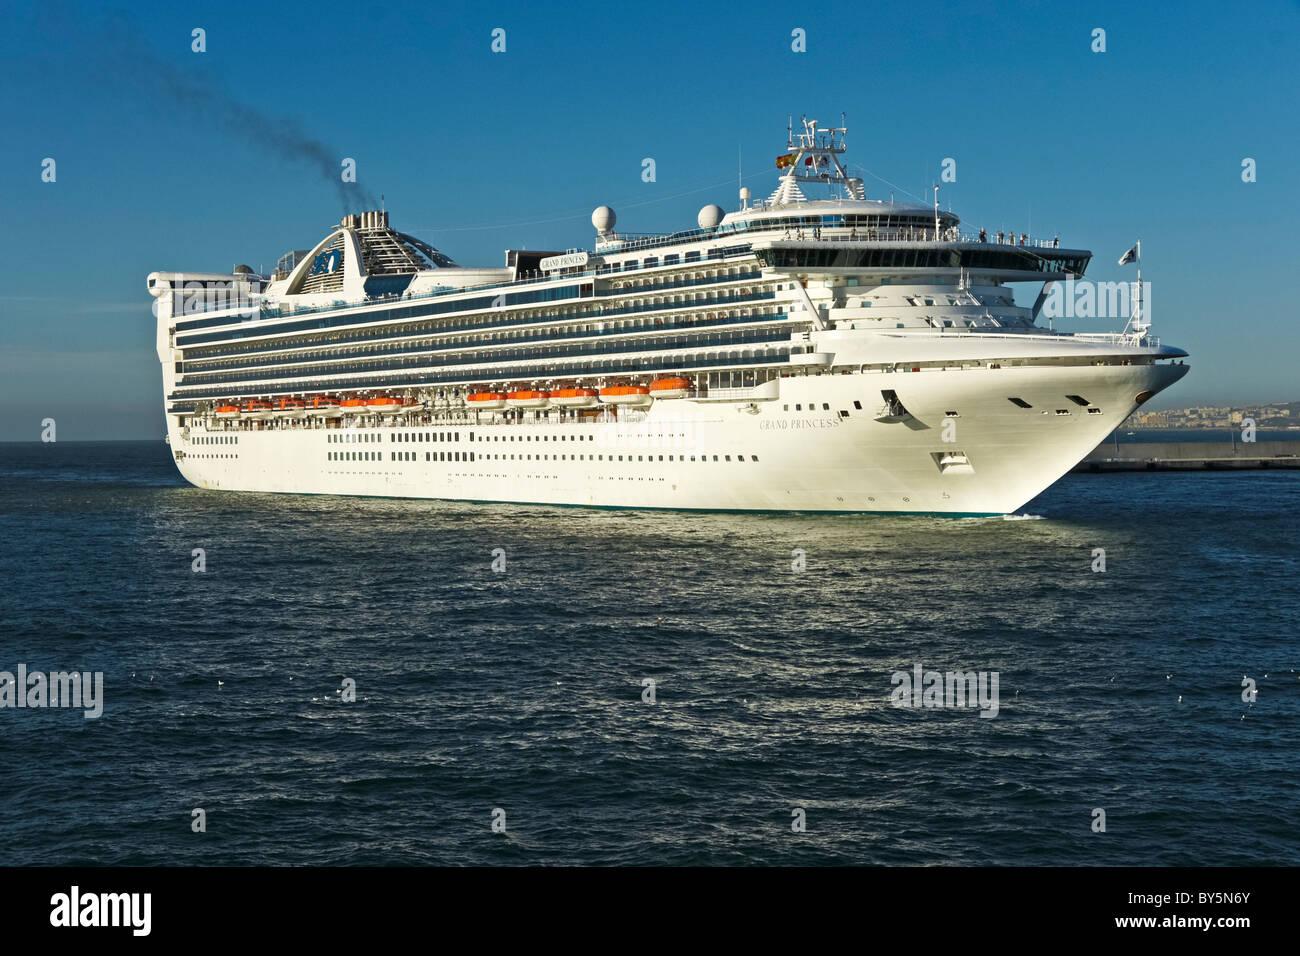 Princess Cruises Grand Class Cruise Ship Grand Princess